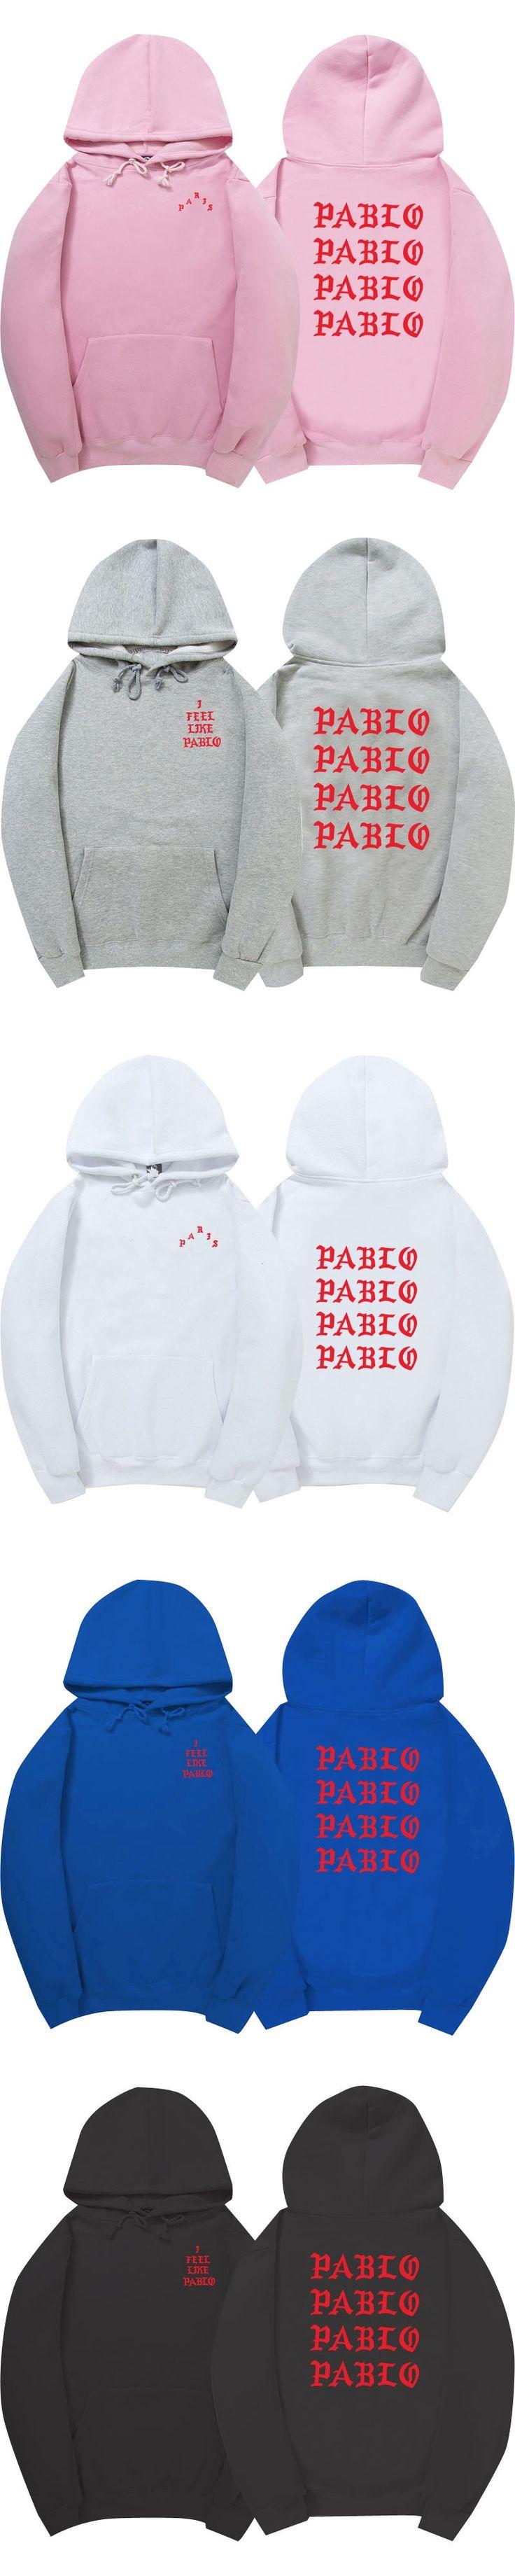 The Life Of Pablo Kanye West Pablo Hoodie Men/Women Hip Hop Pull Paris Opening Saint Pablo I Feel Like Paul Sweatshirts